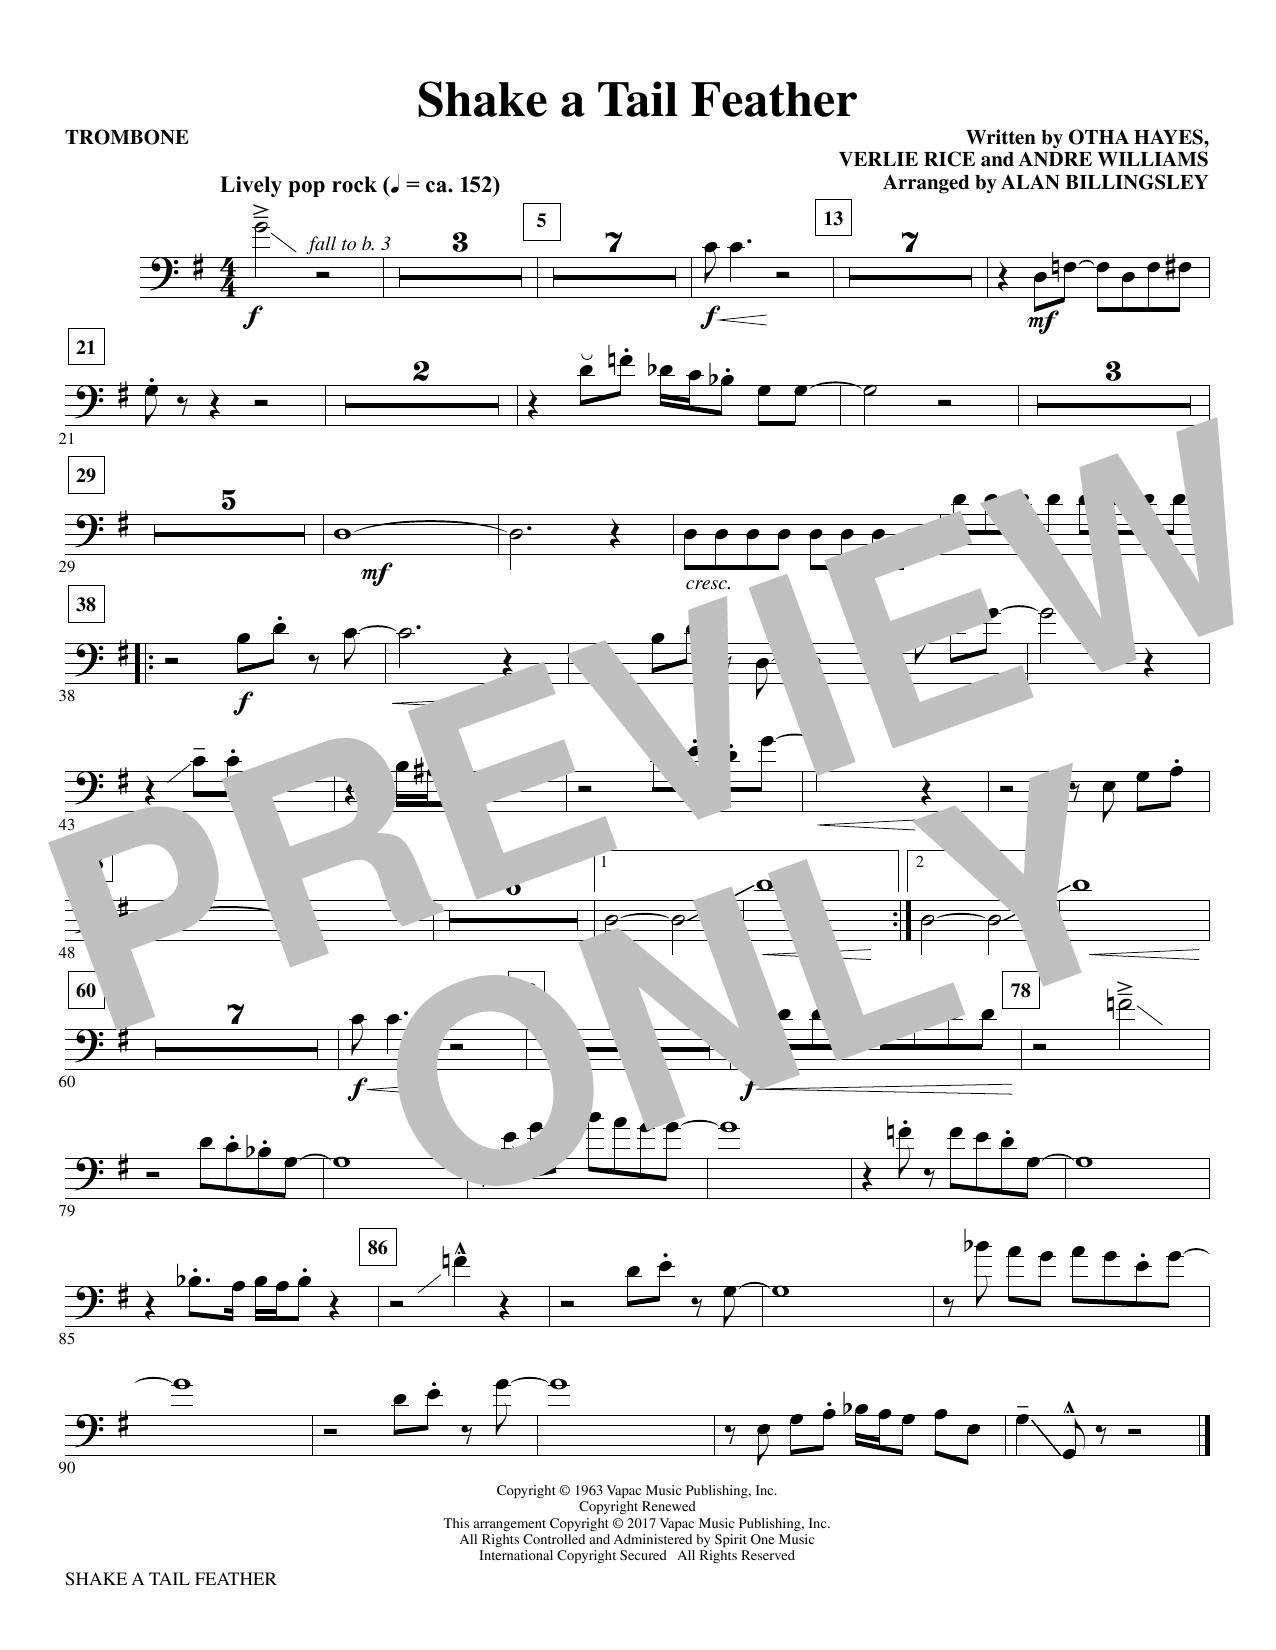 Shake a Tail Feather - Trombone Sheet Music